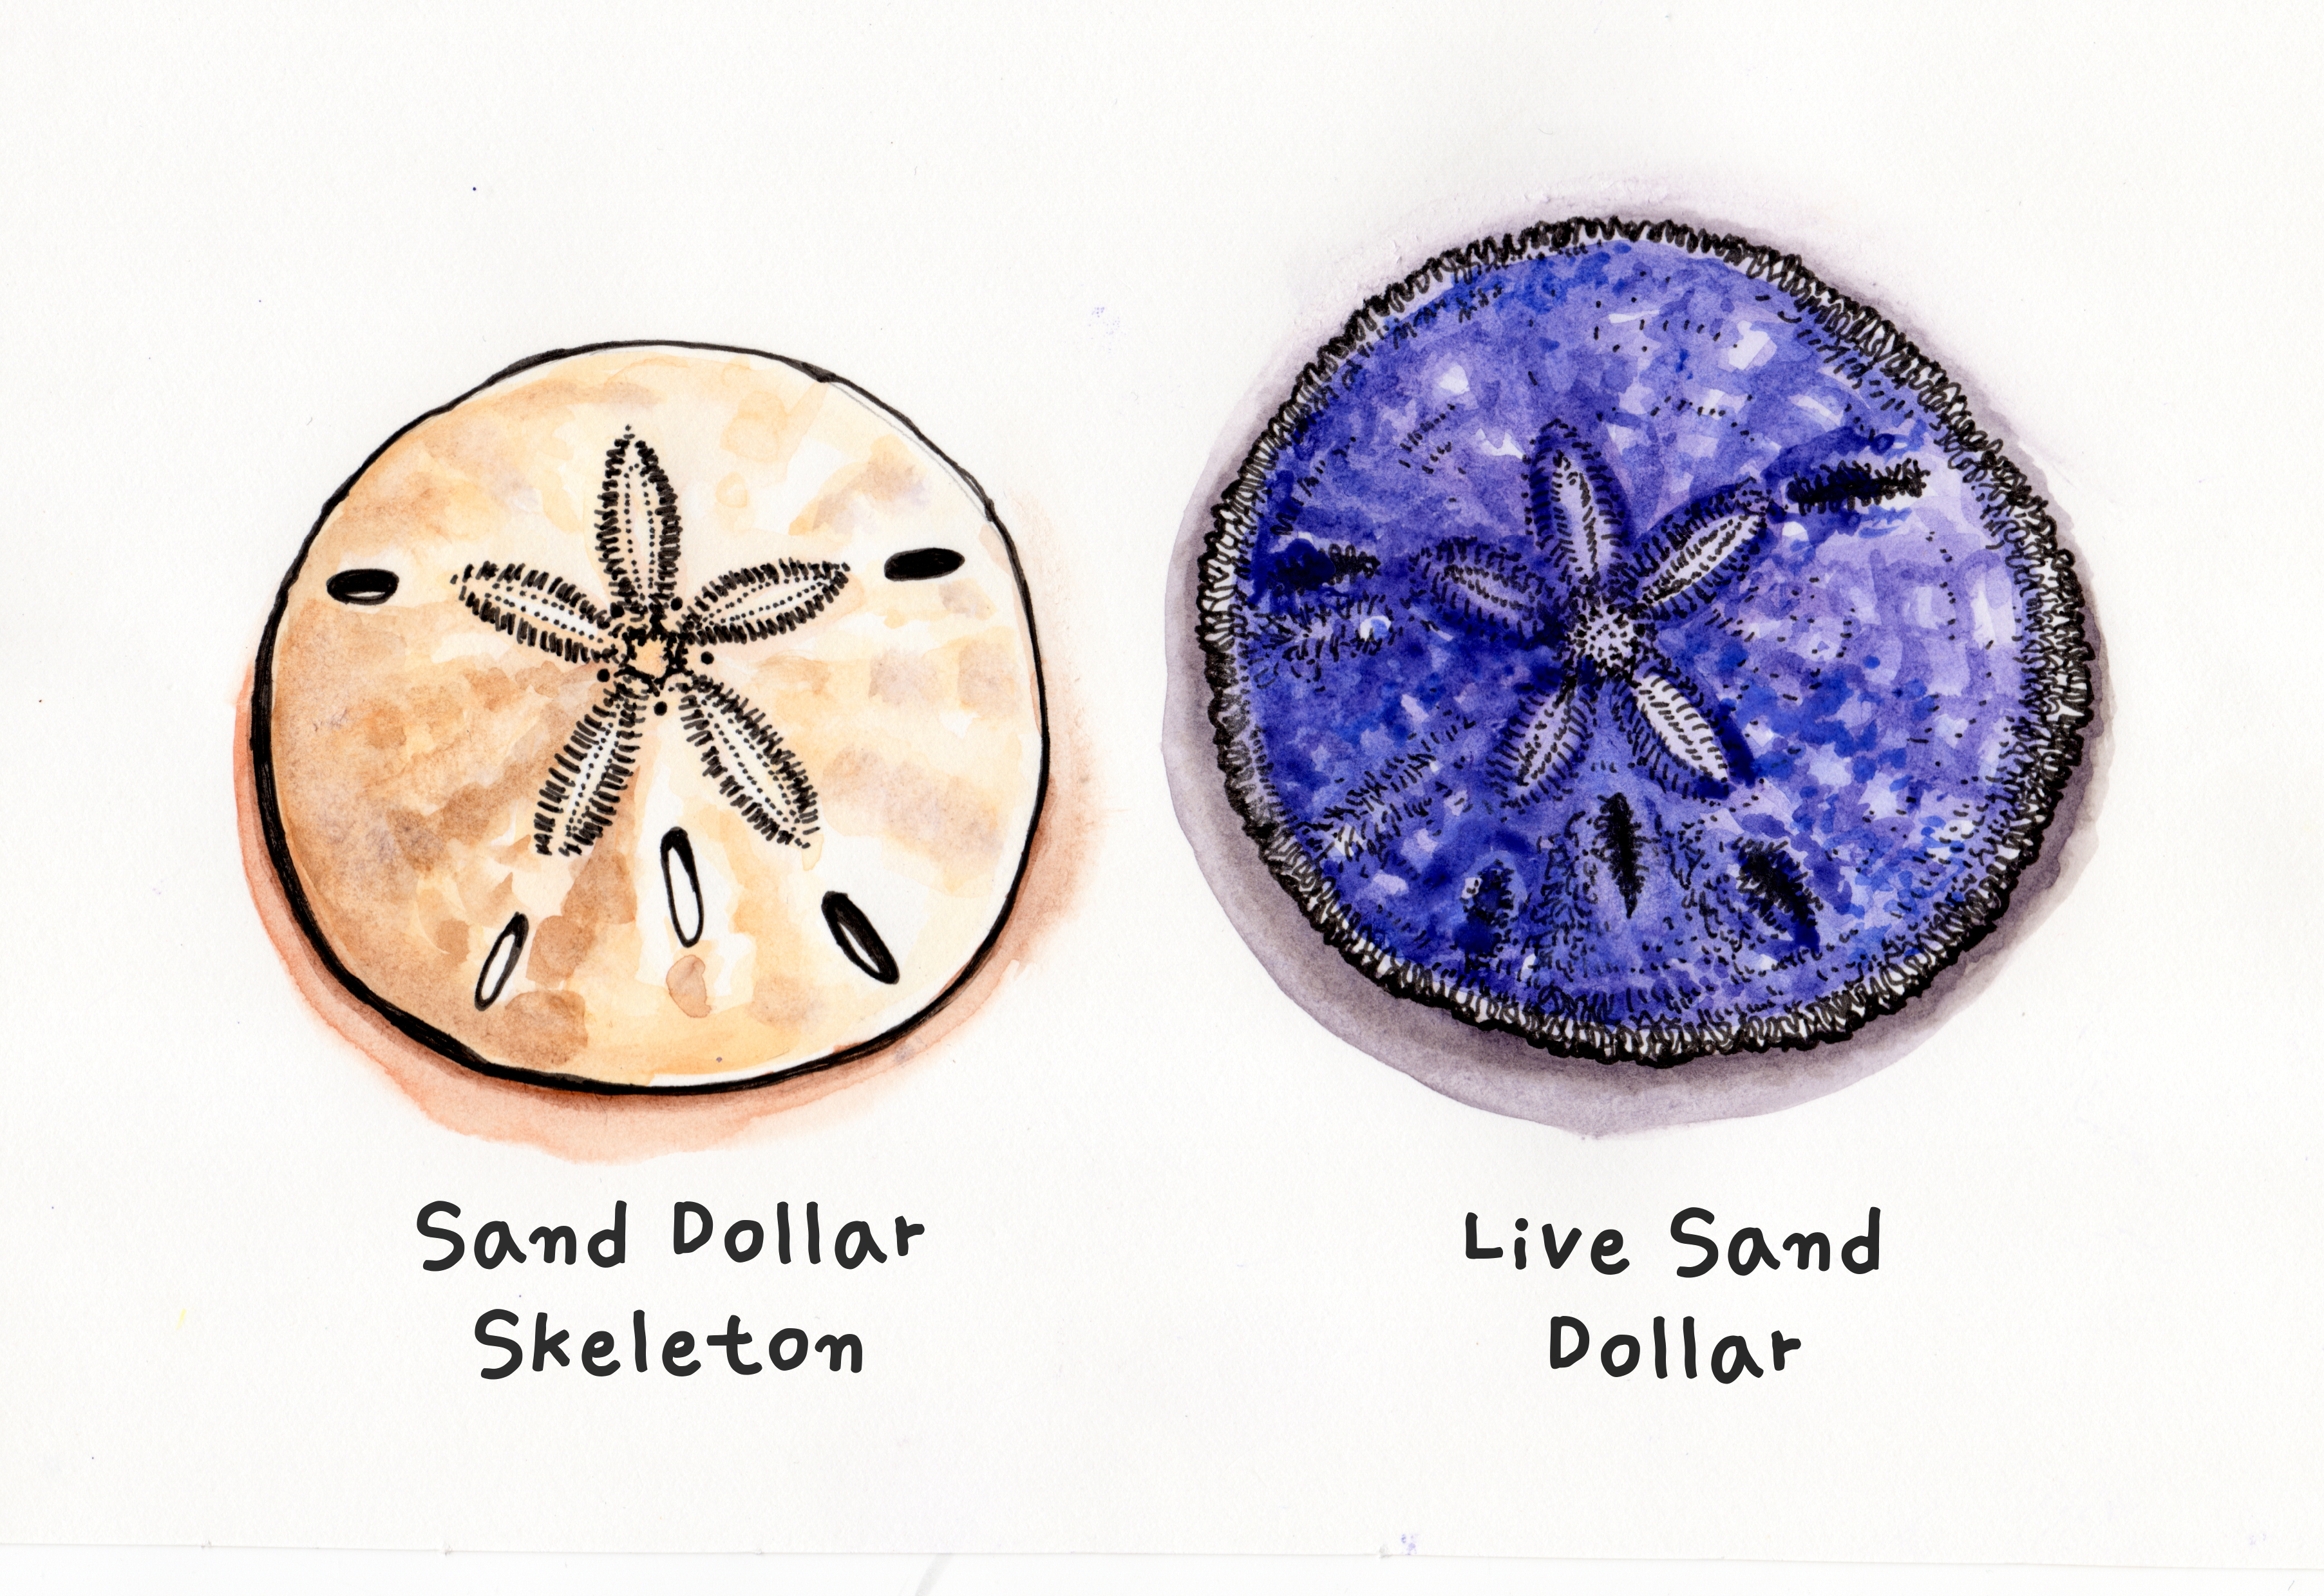 Live Sand Dollar Skeleton Png 3609 2479 Sand Dollar Sand Dollar